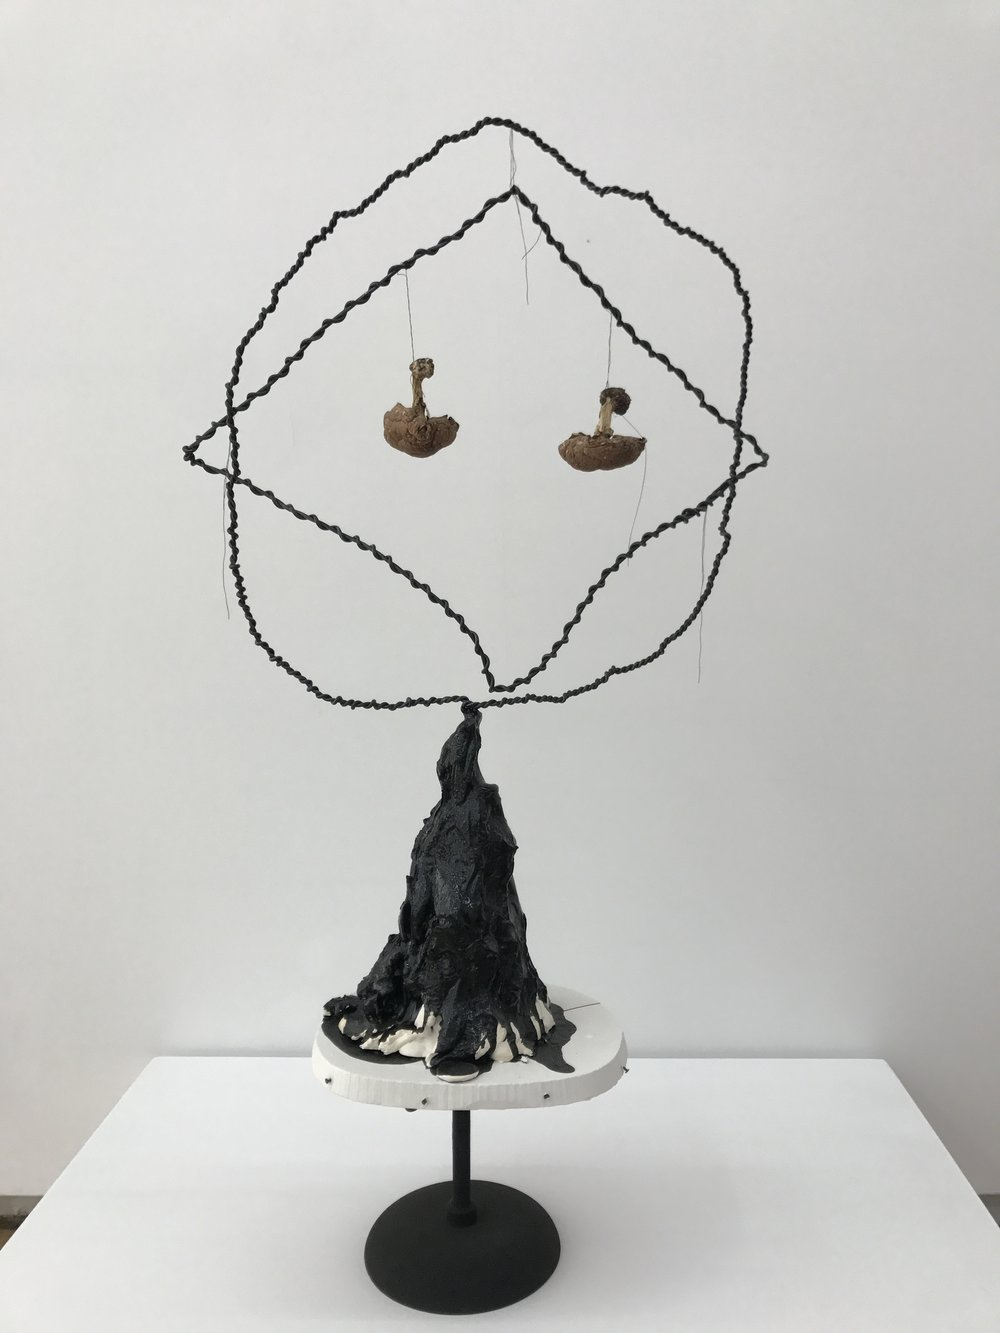 Michelle Segre,Untitled (Dual Mushrooms), 2016